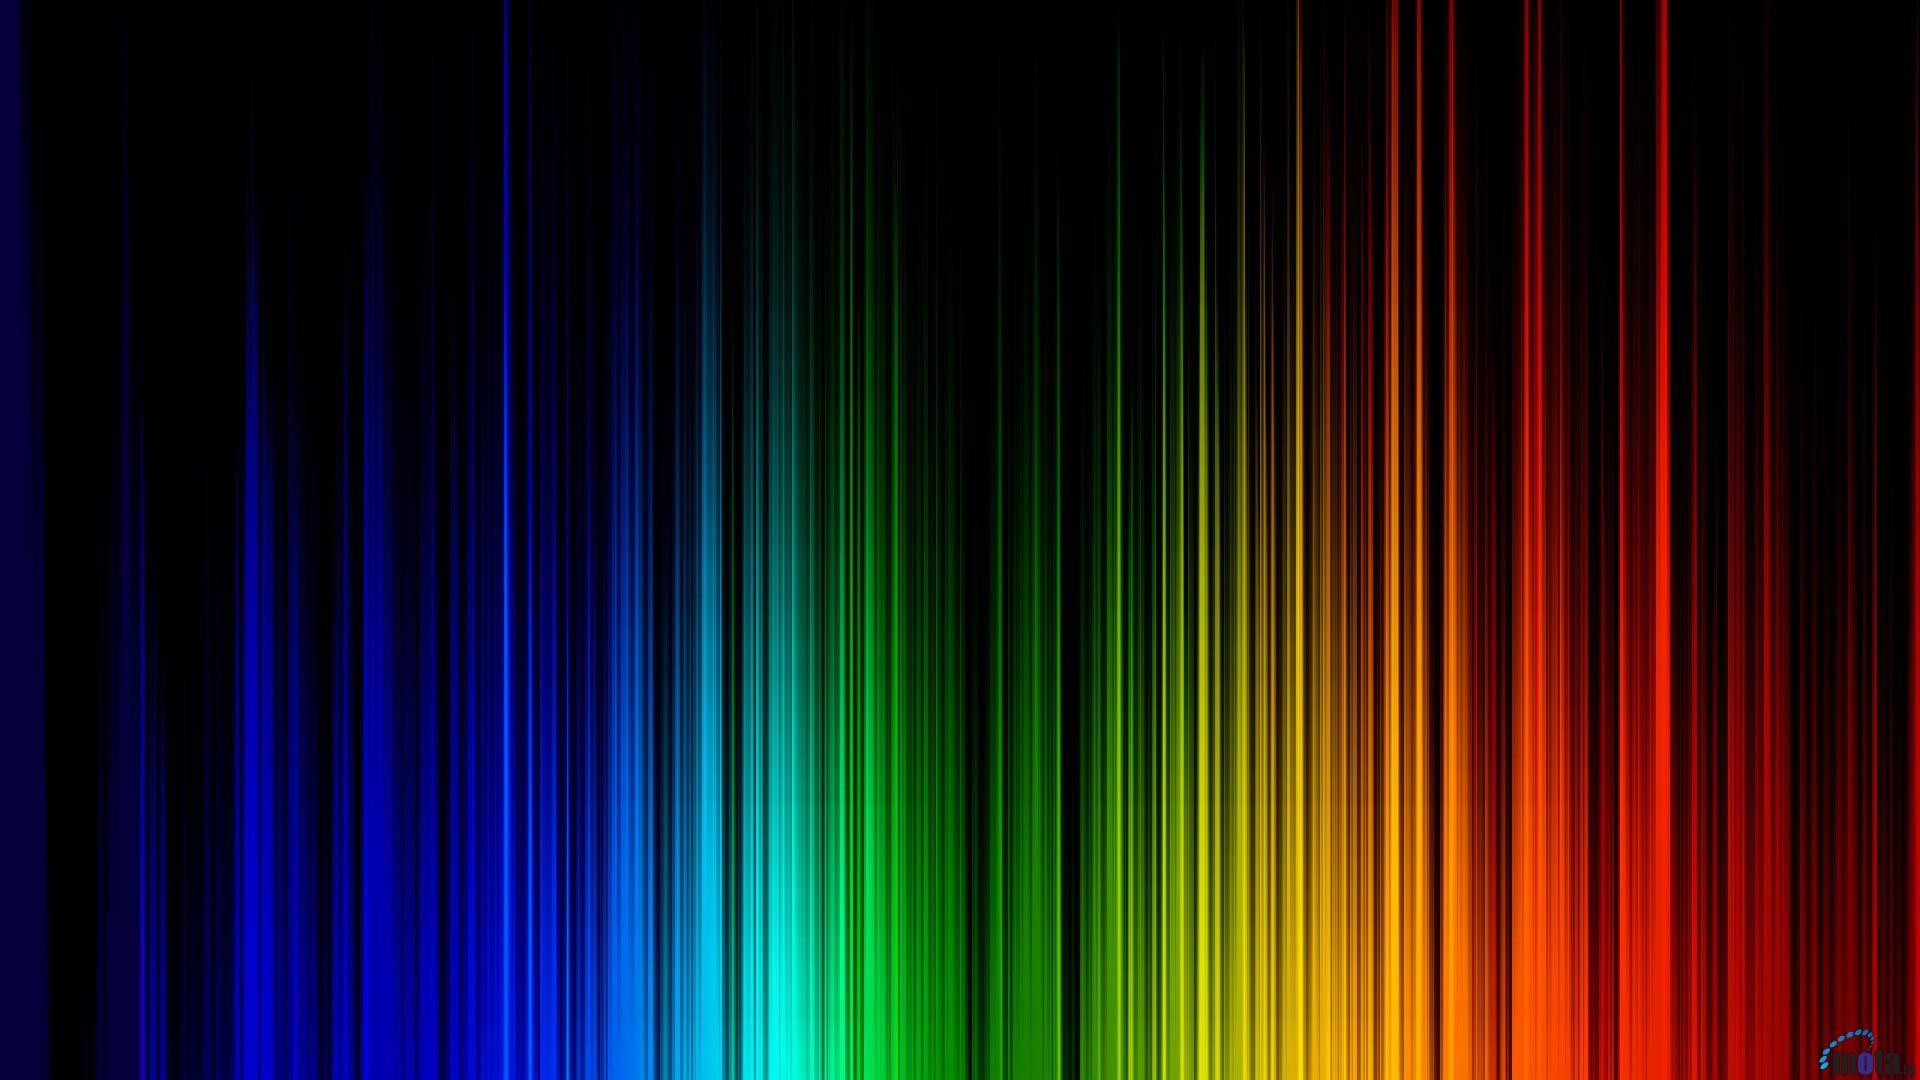 Rainbow Wallpaper: Rainbow Colored Wallpaper